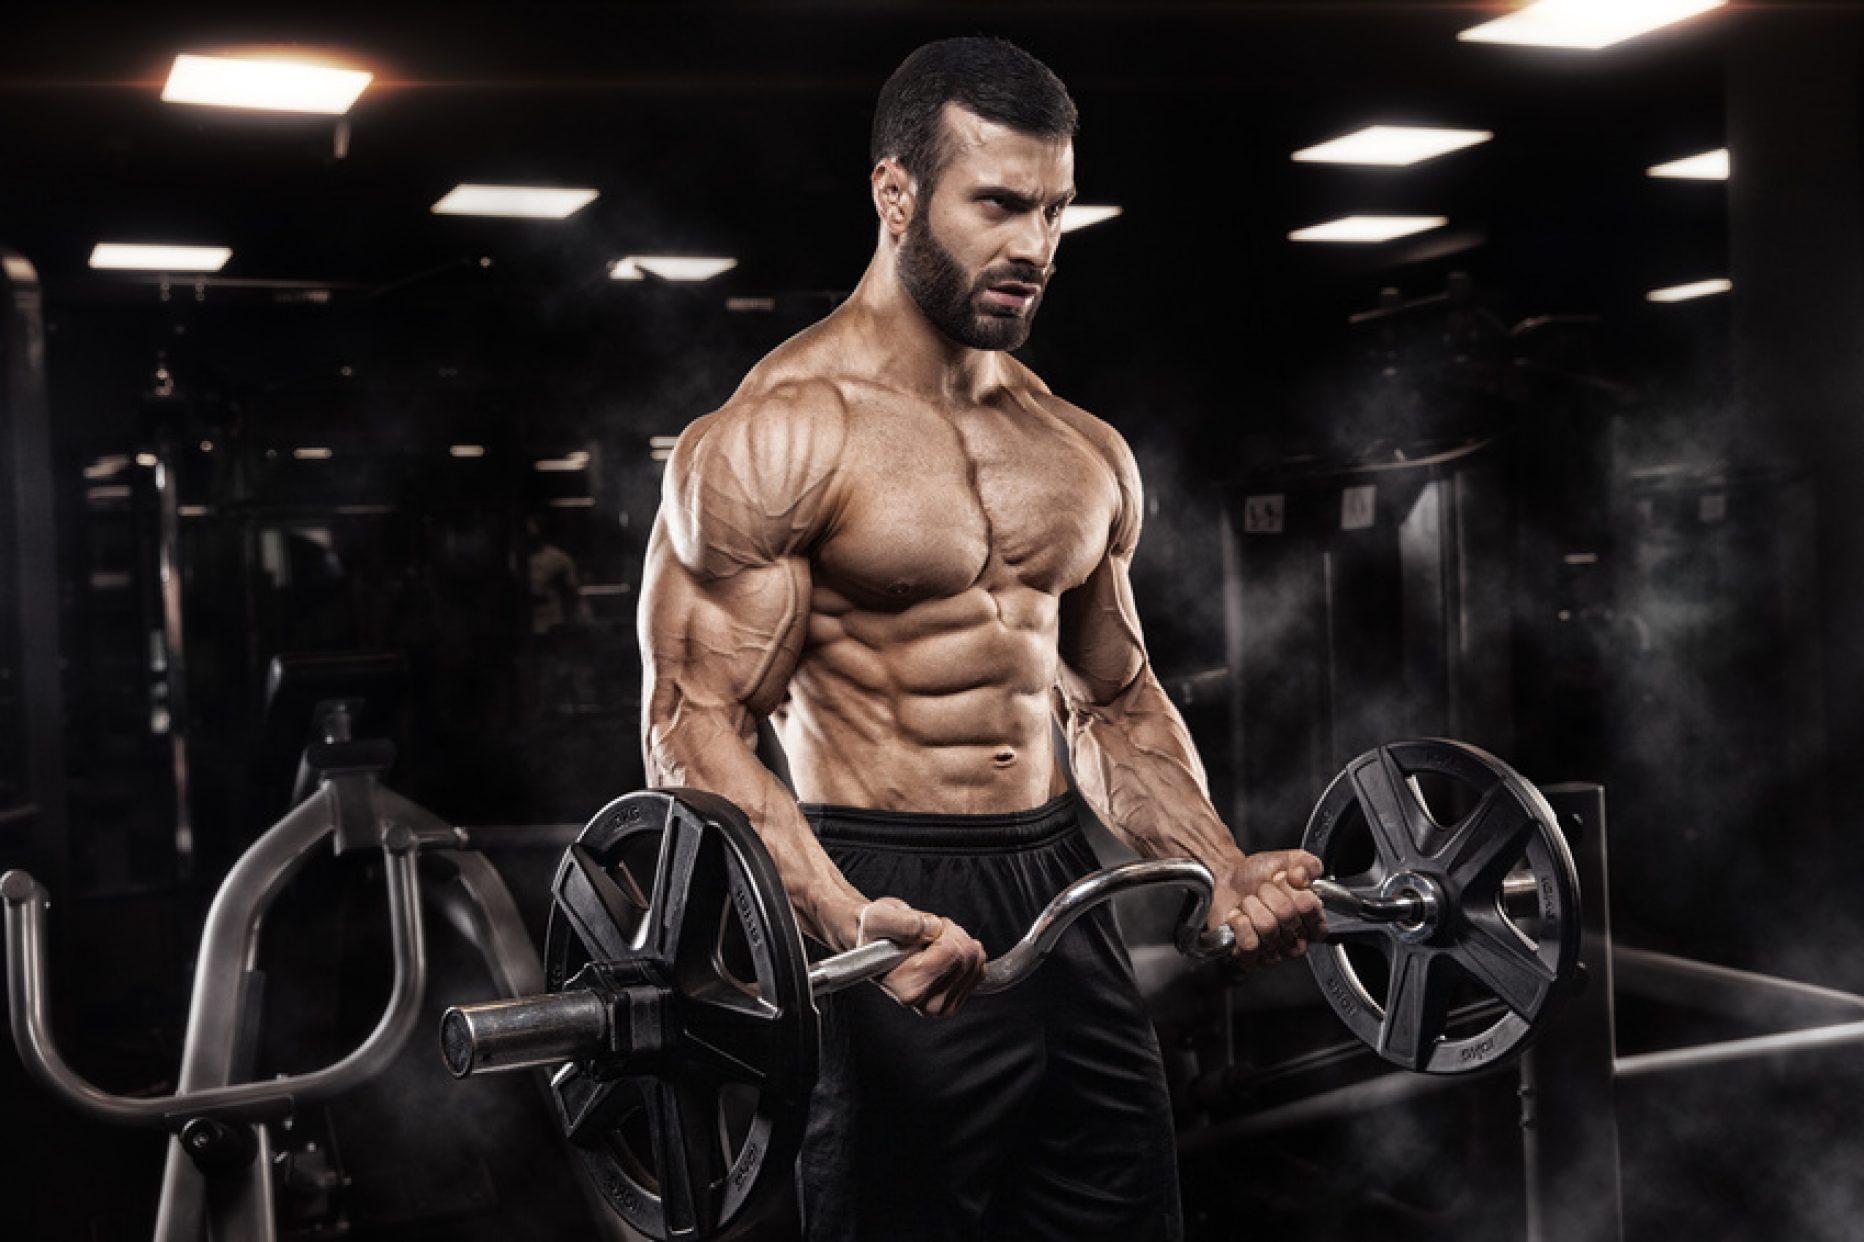 Glutation to duże i silne muskuły